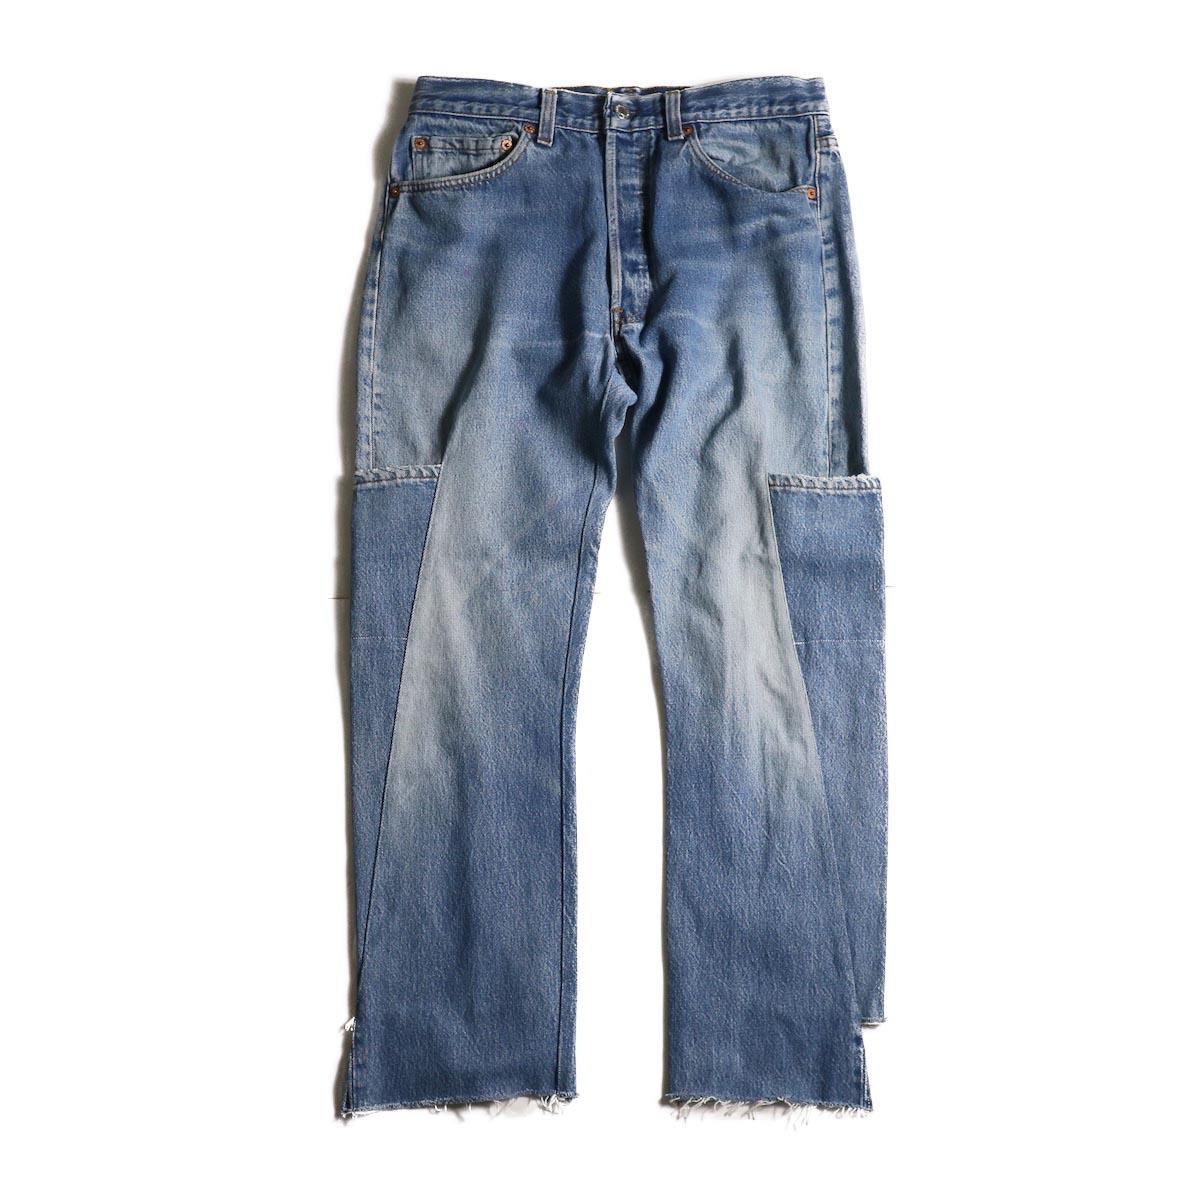 OLD PARK / 7Pocket Jeans -Blue (Msize-A)正面